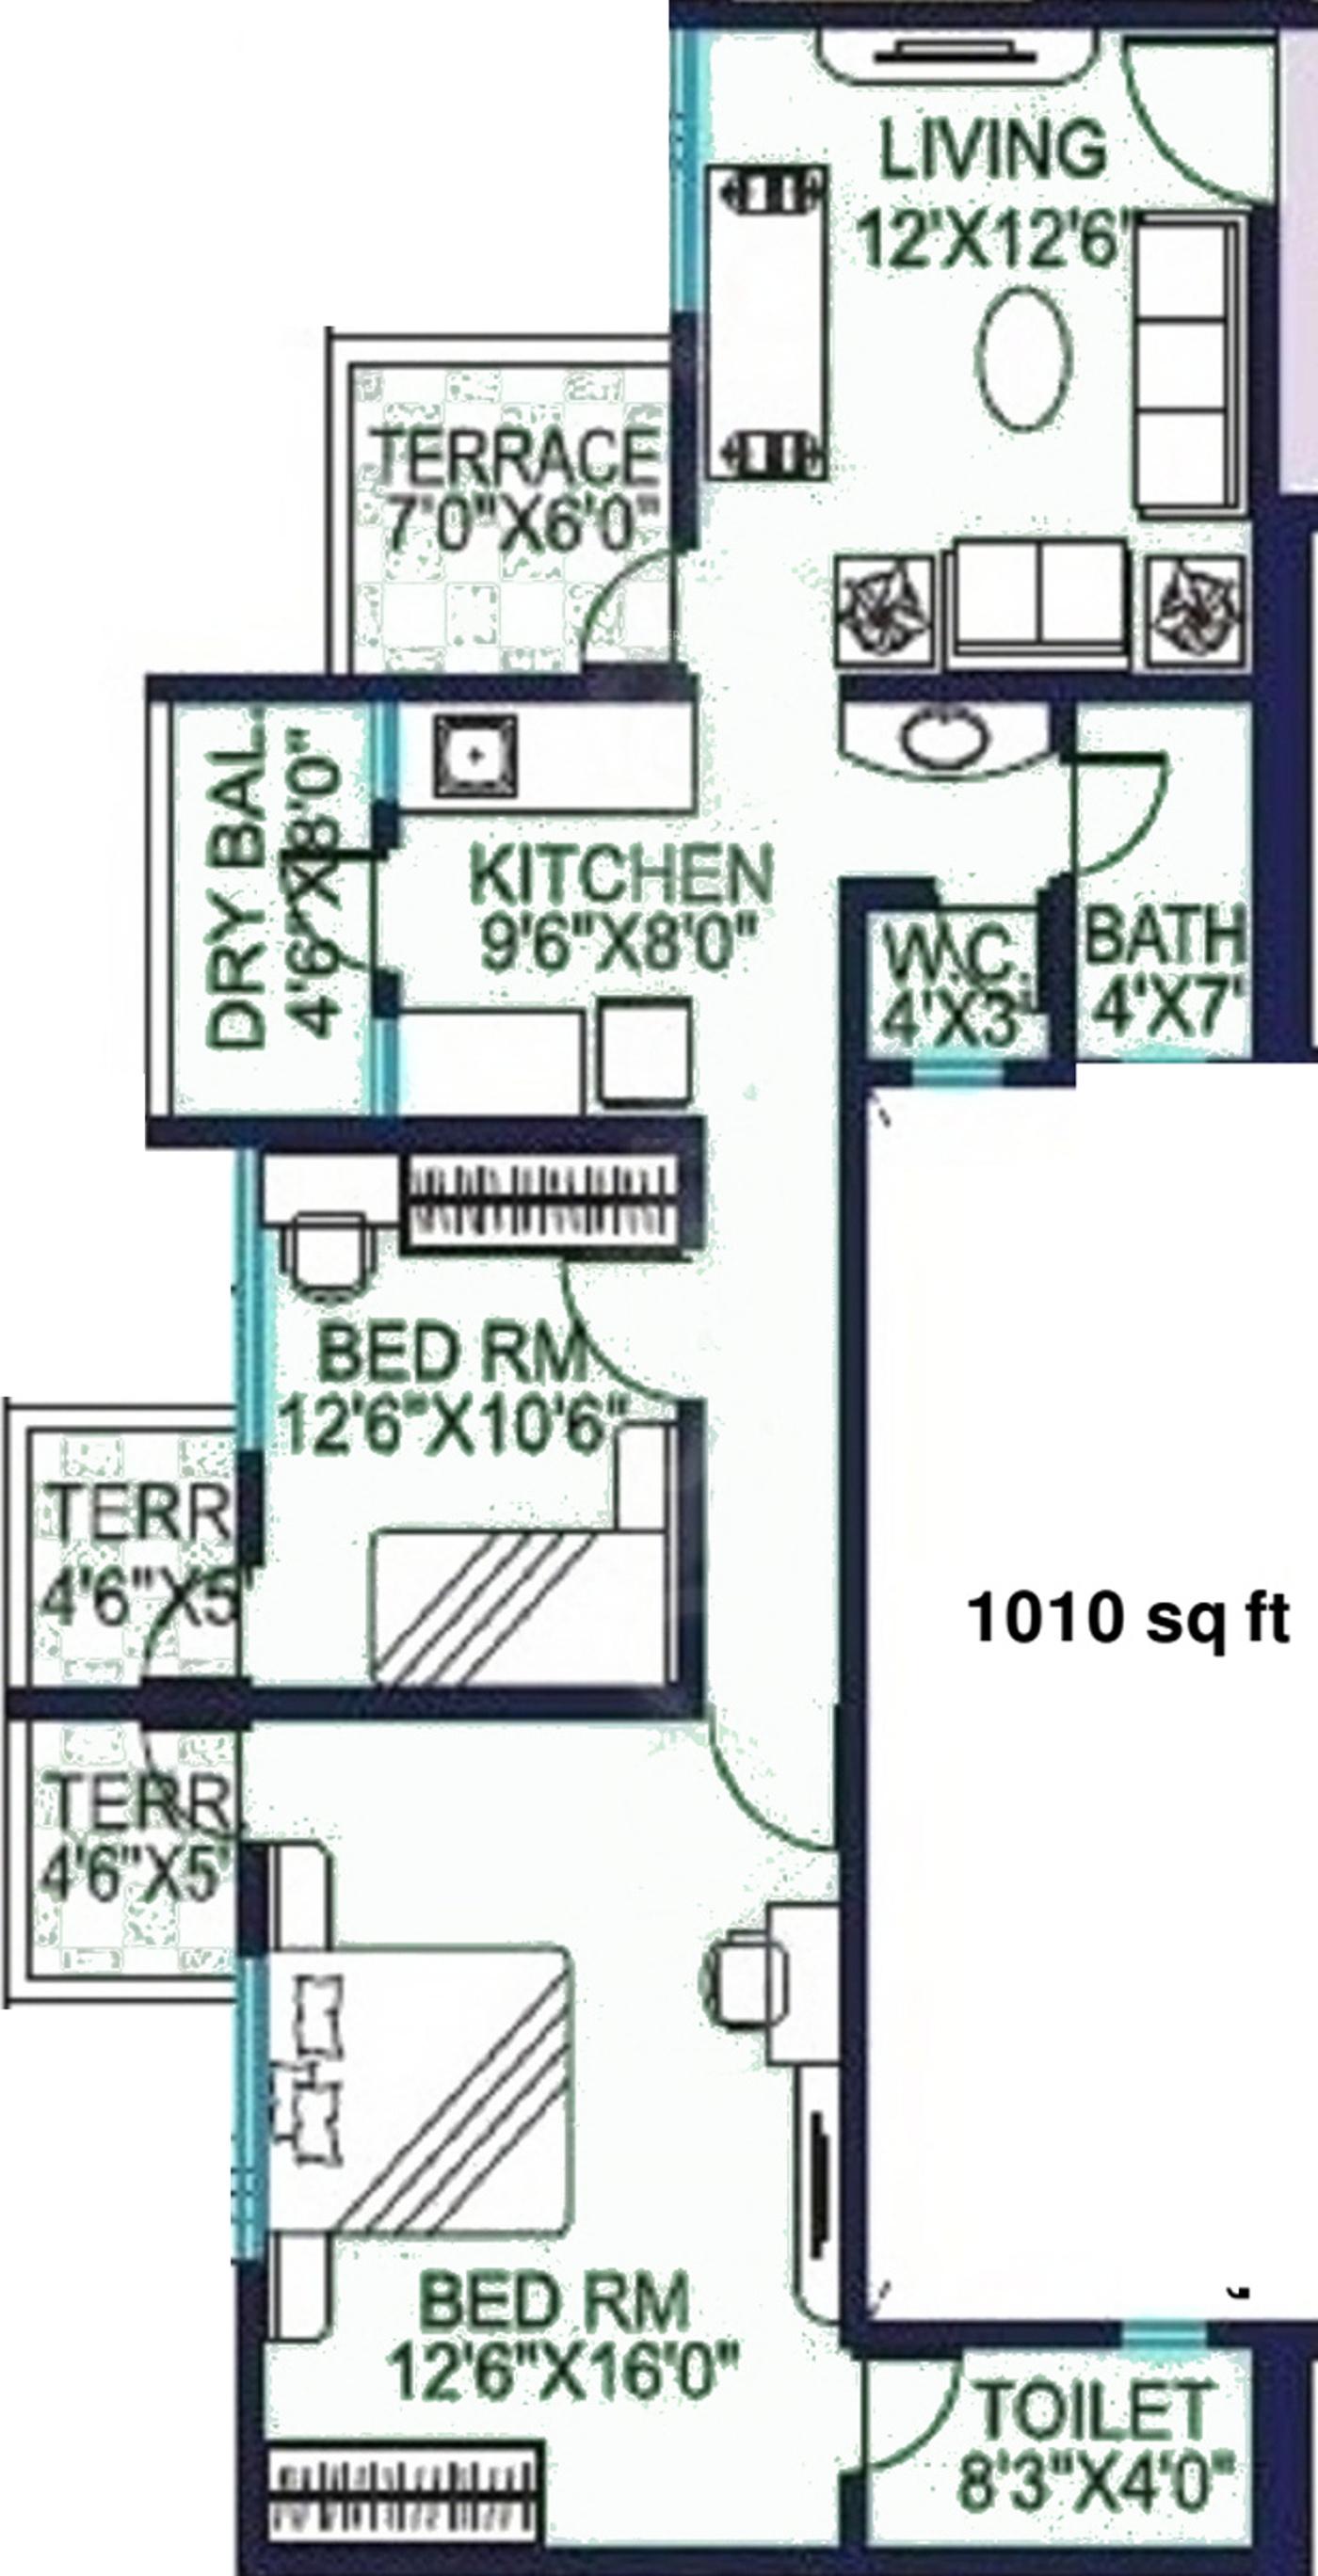 1010 Sq Ft 2 Bhk 2t Apartment For Sale In Shree Balaji